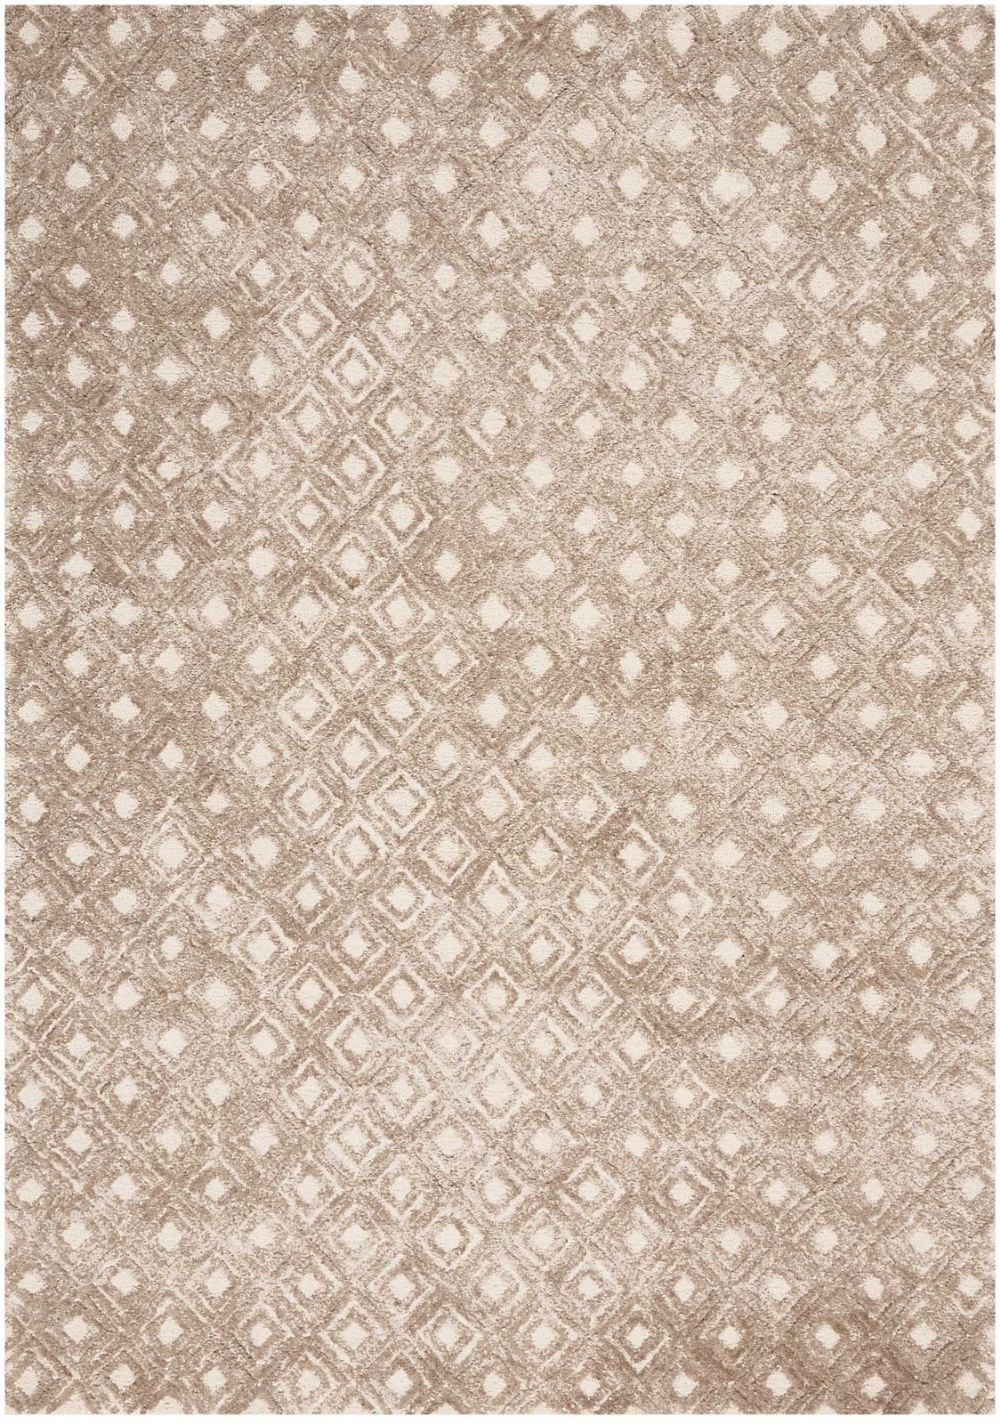 nourison deco mod contemporary area rug collection